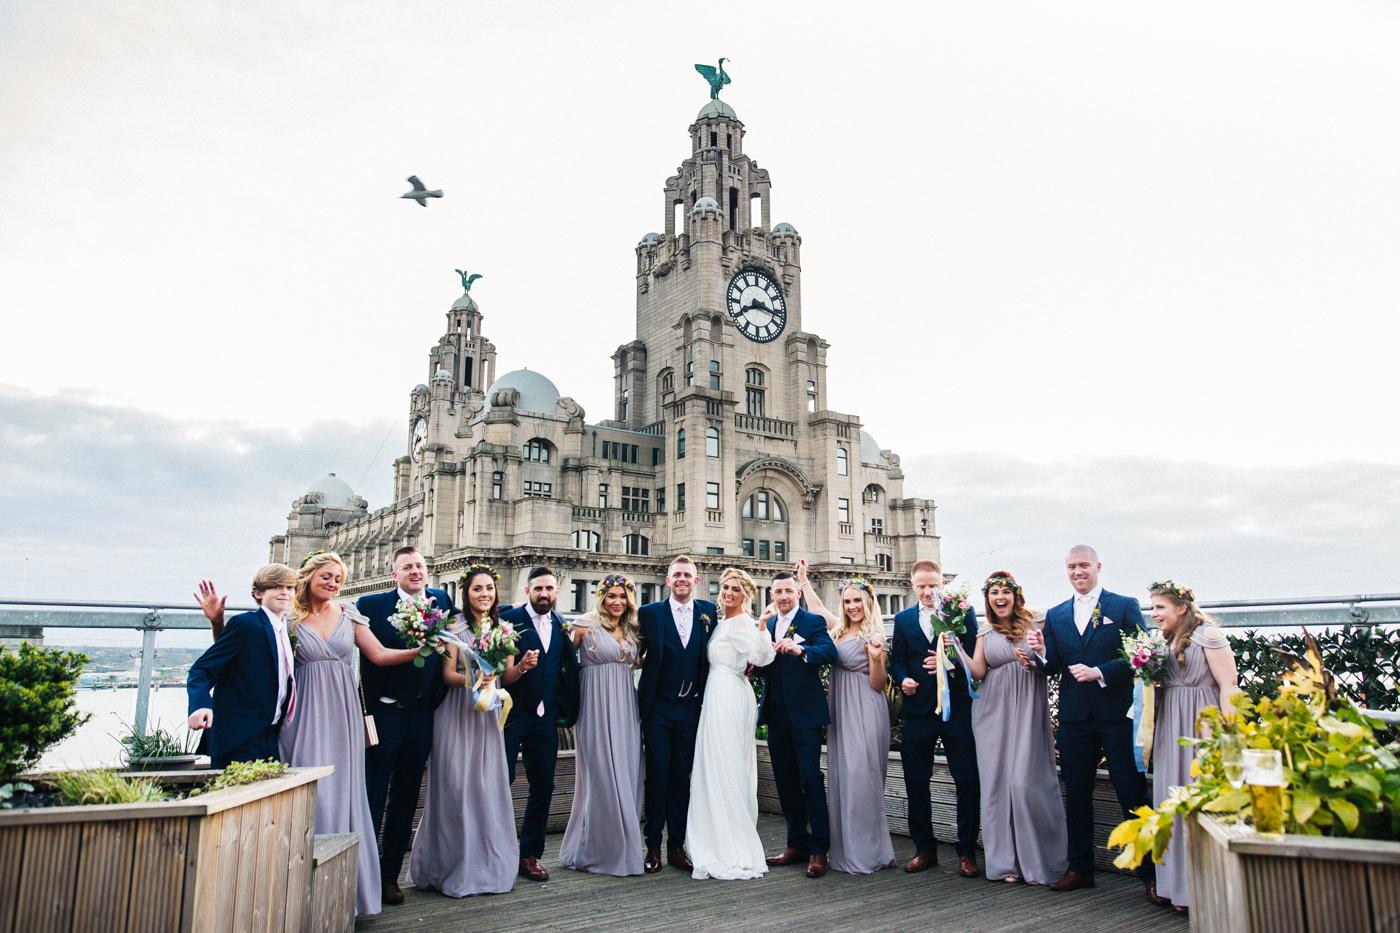 teesside-middlesbrough-north-east-wedding-photographer-creative-wedding-venues-0027.jpg